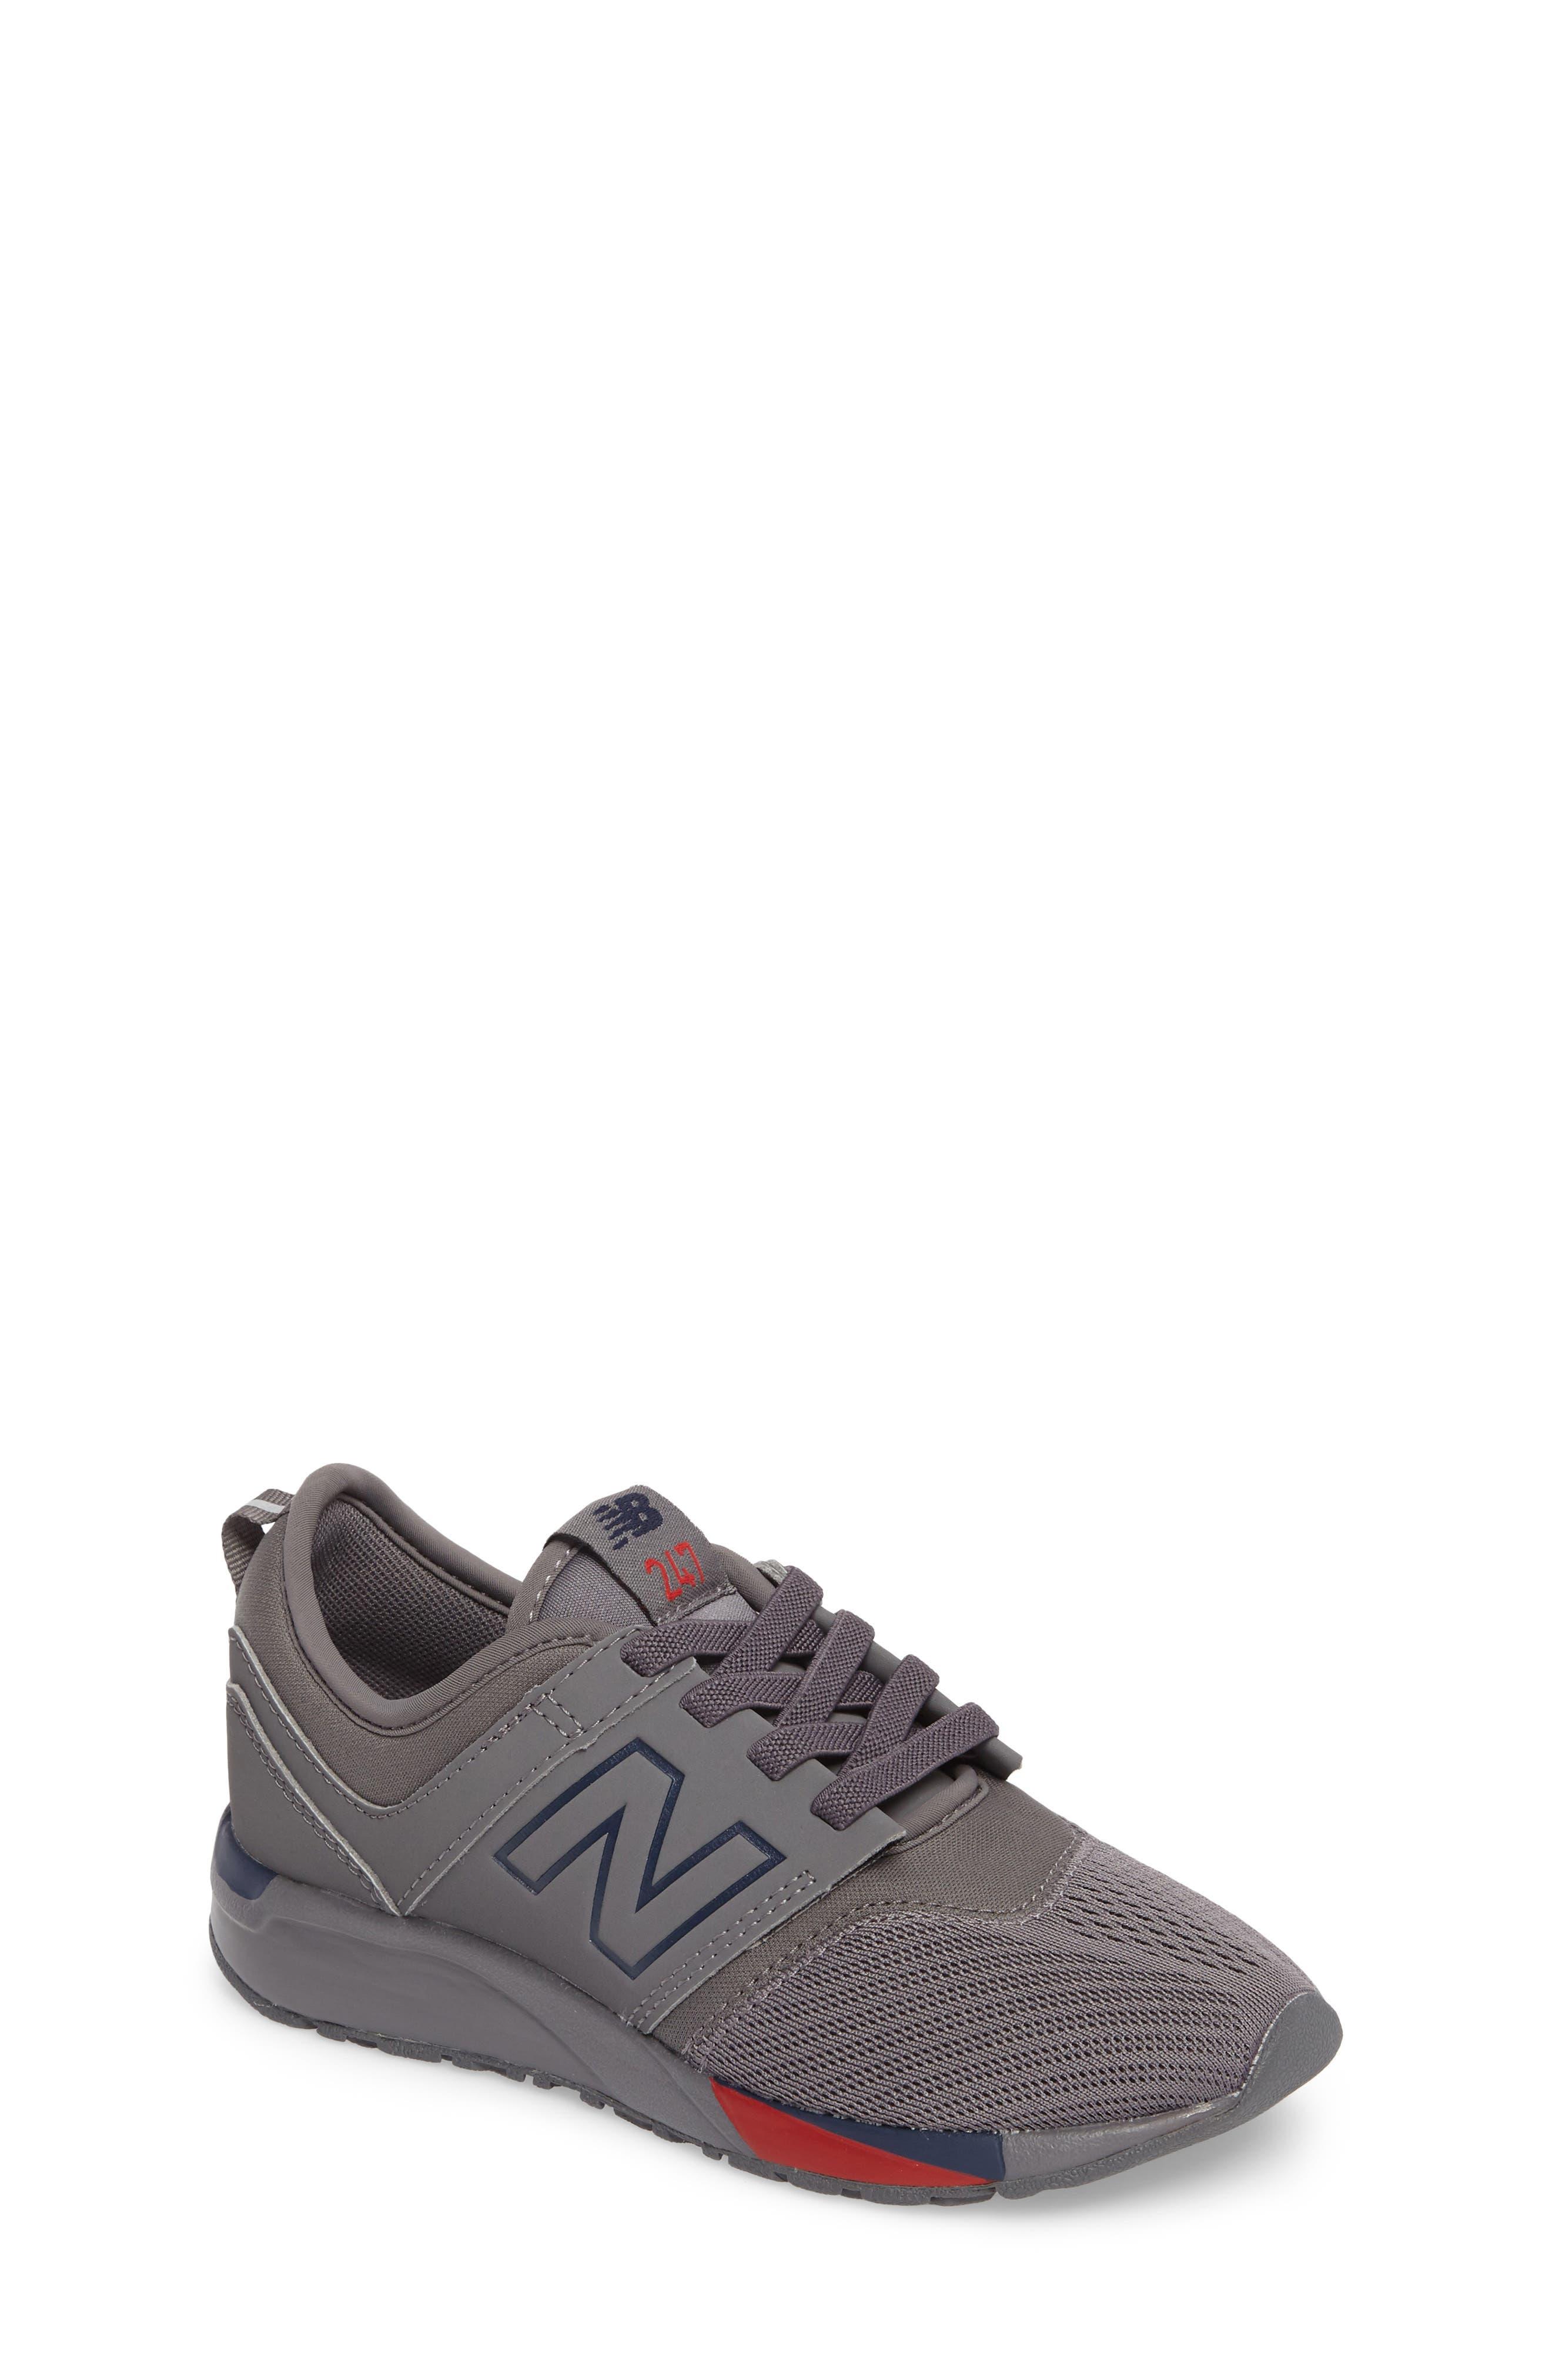 Alternate Image 1 Selected - New Balance 247 Sport Sneaker (Baby, Walker, Toddler, Little Kid & Big Kid)